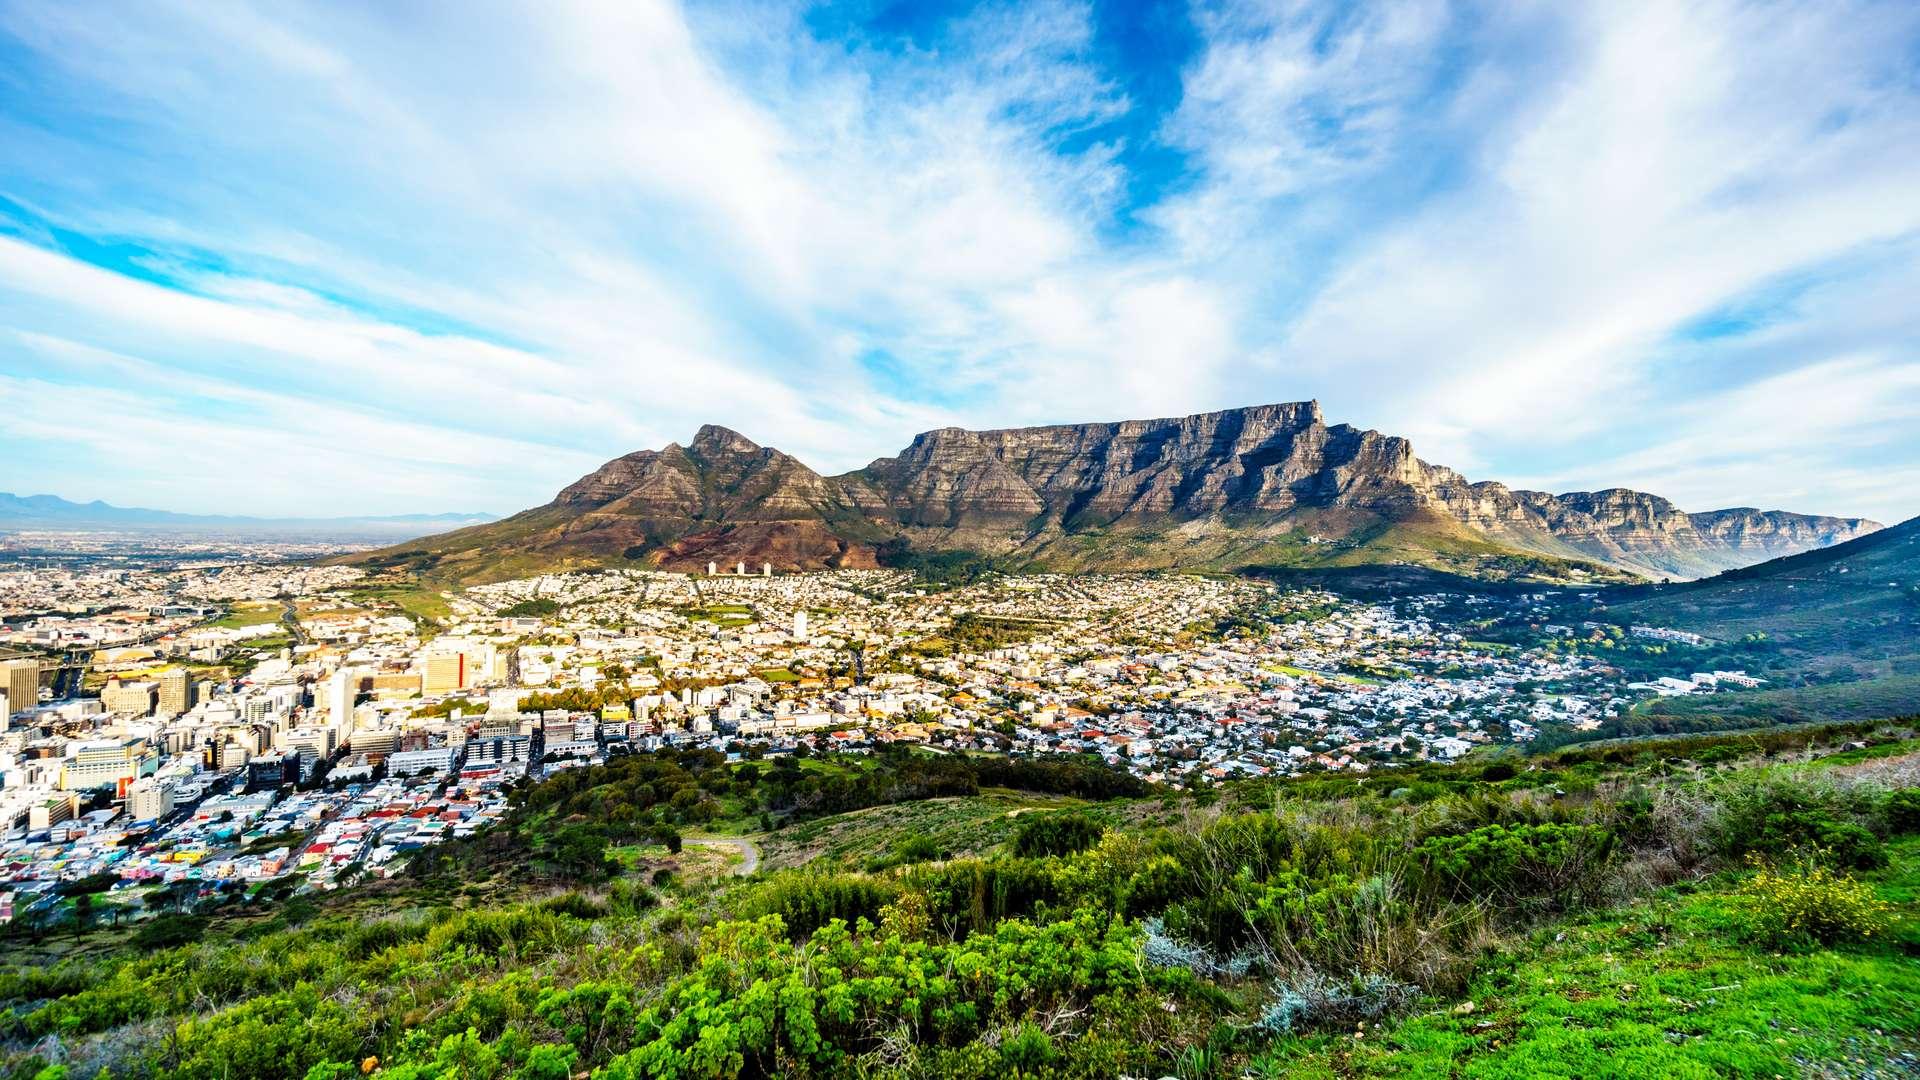 Zuid Afrika Kaapstad Table Mountain, Devils Peak, Lions Head and the Twelve Apostle